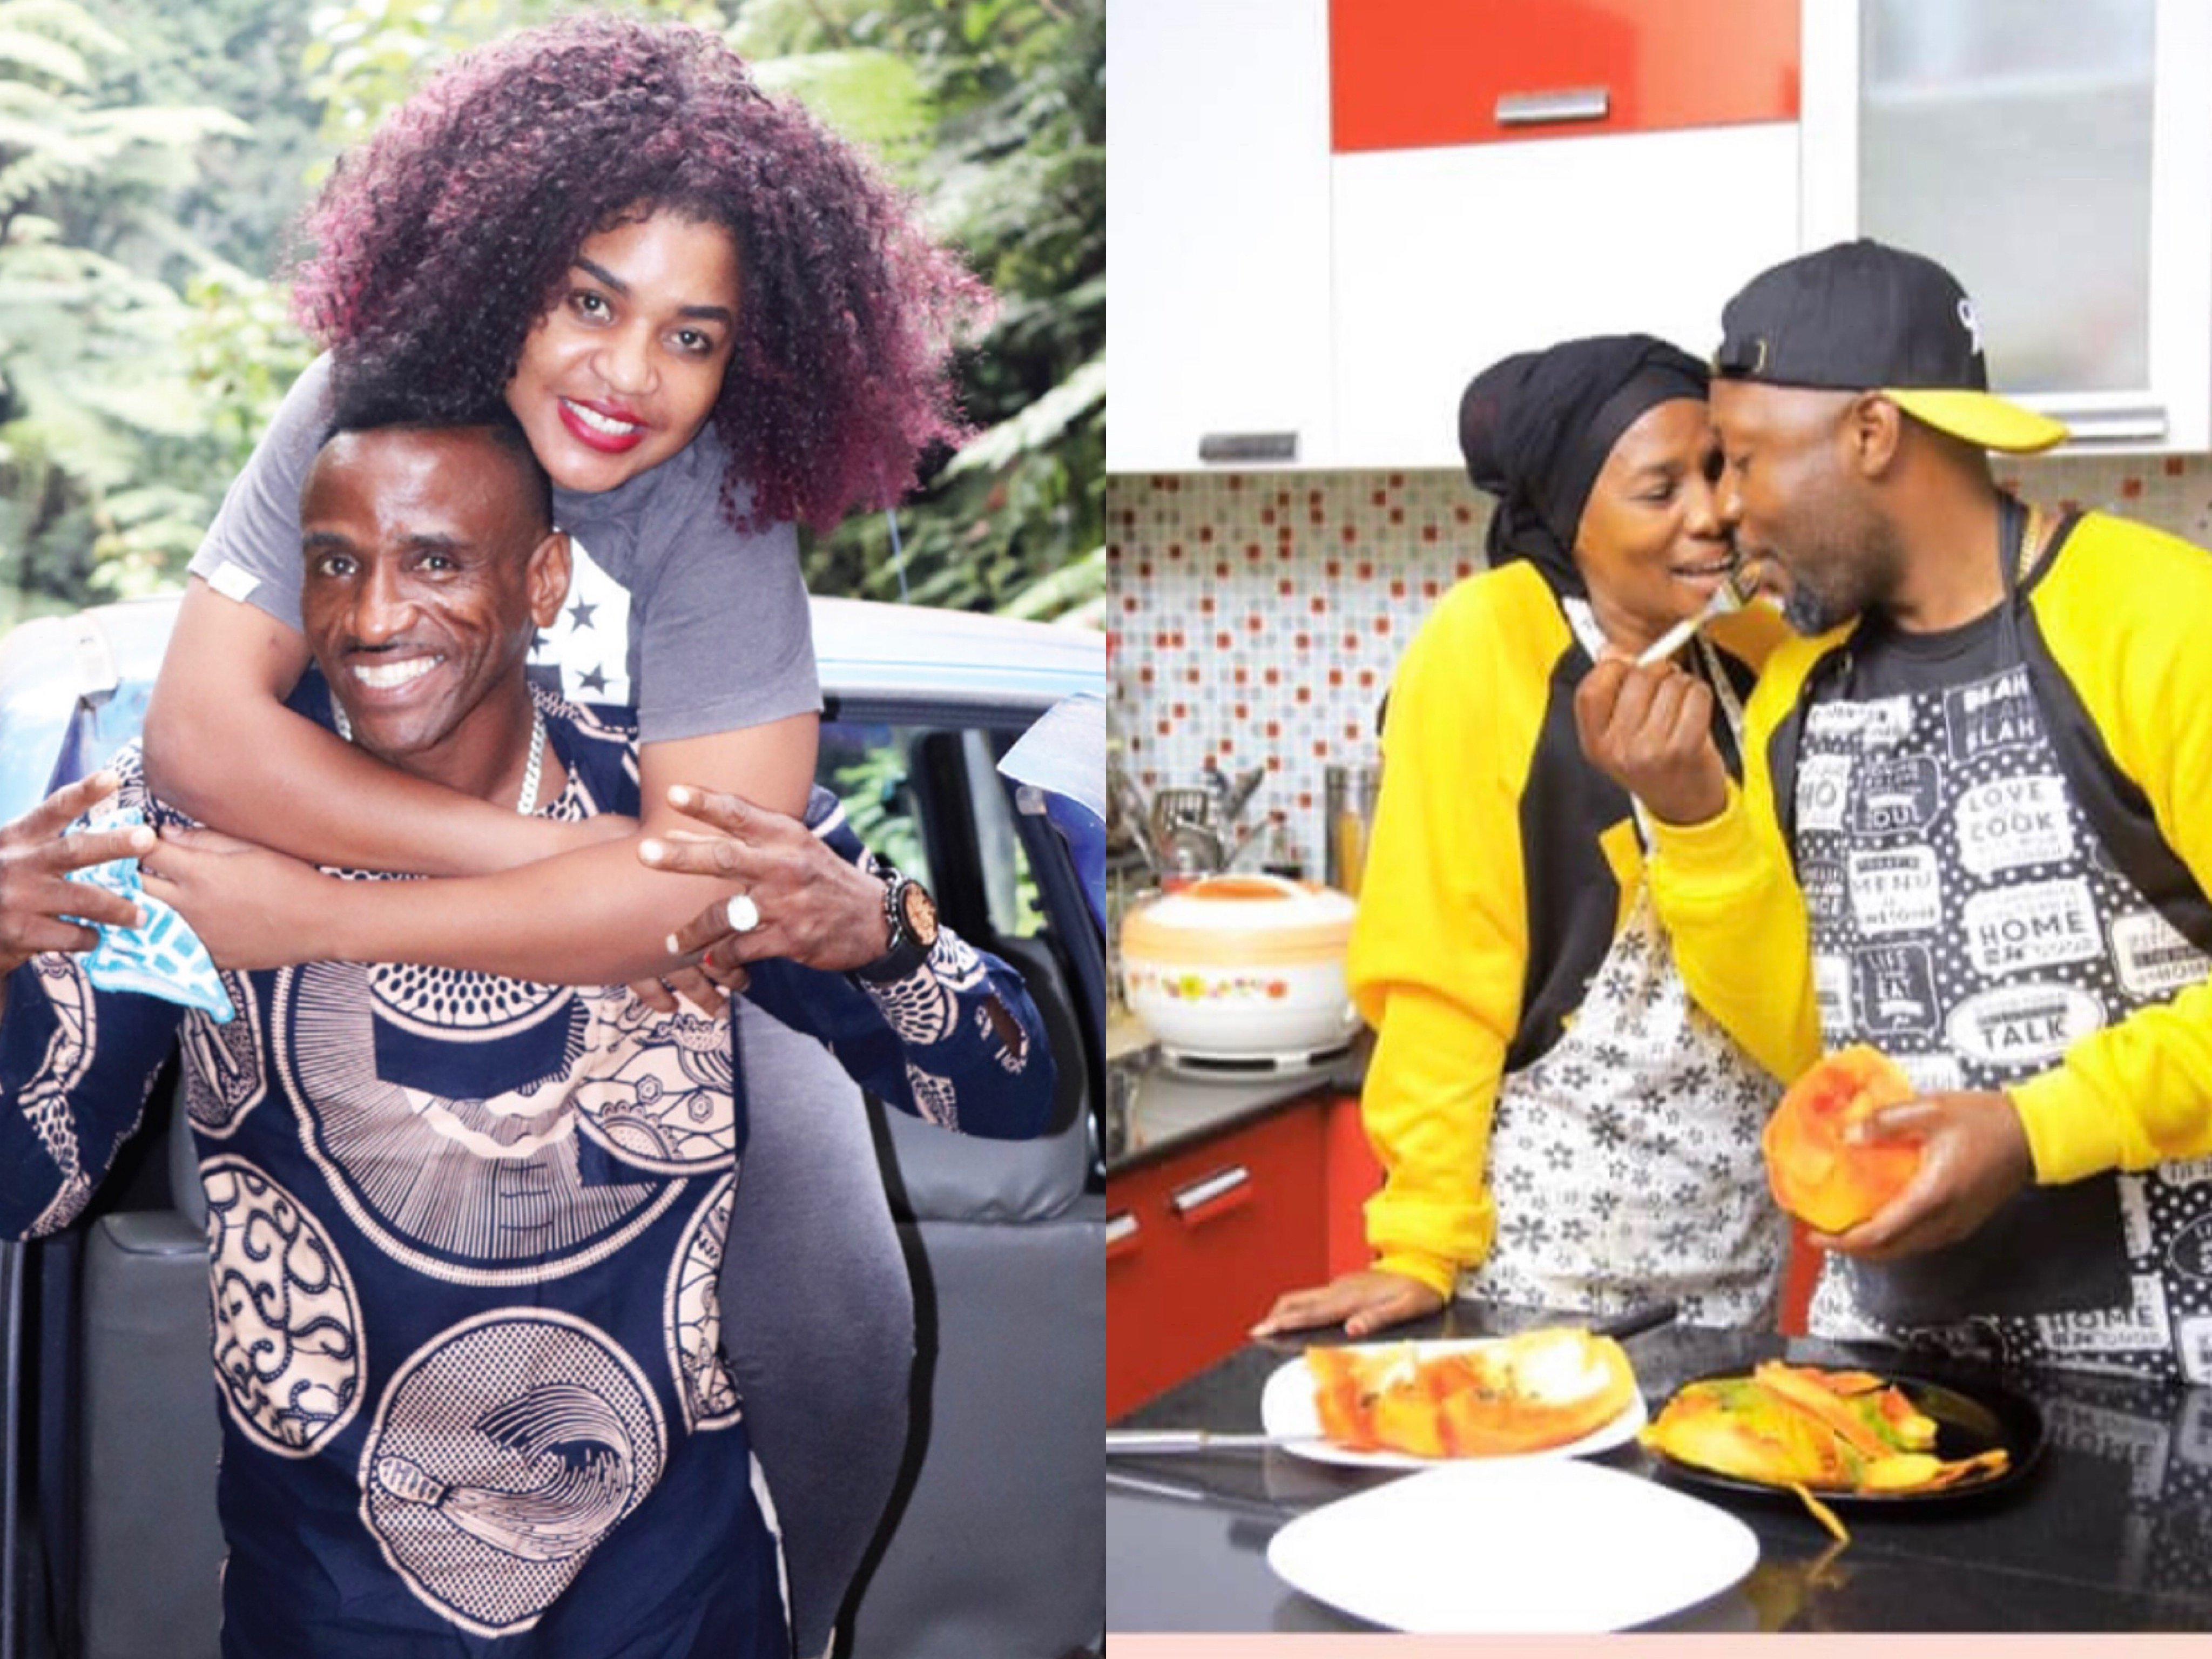 Photos of Baba Diamond Platnumz getting cozy with young Tanzanian actress